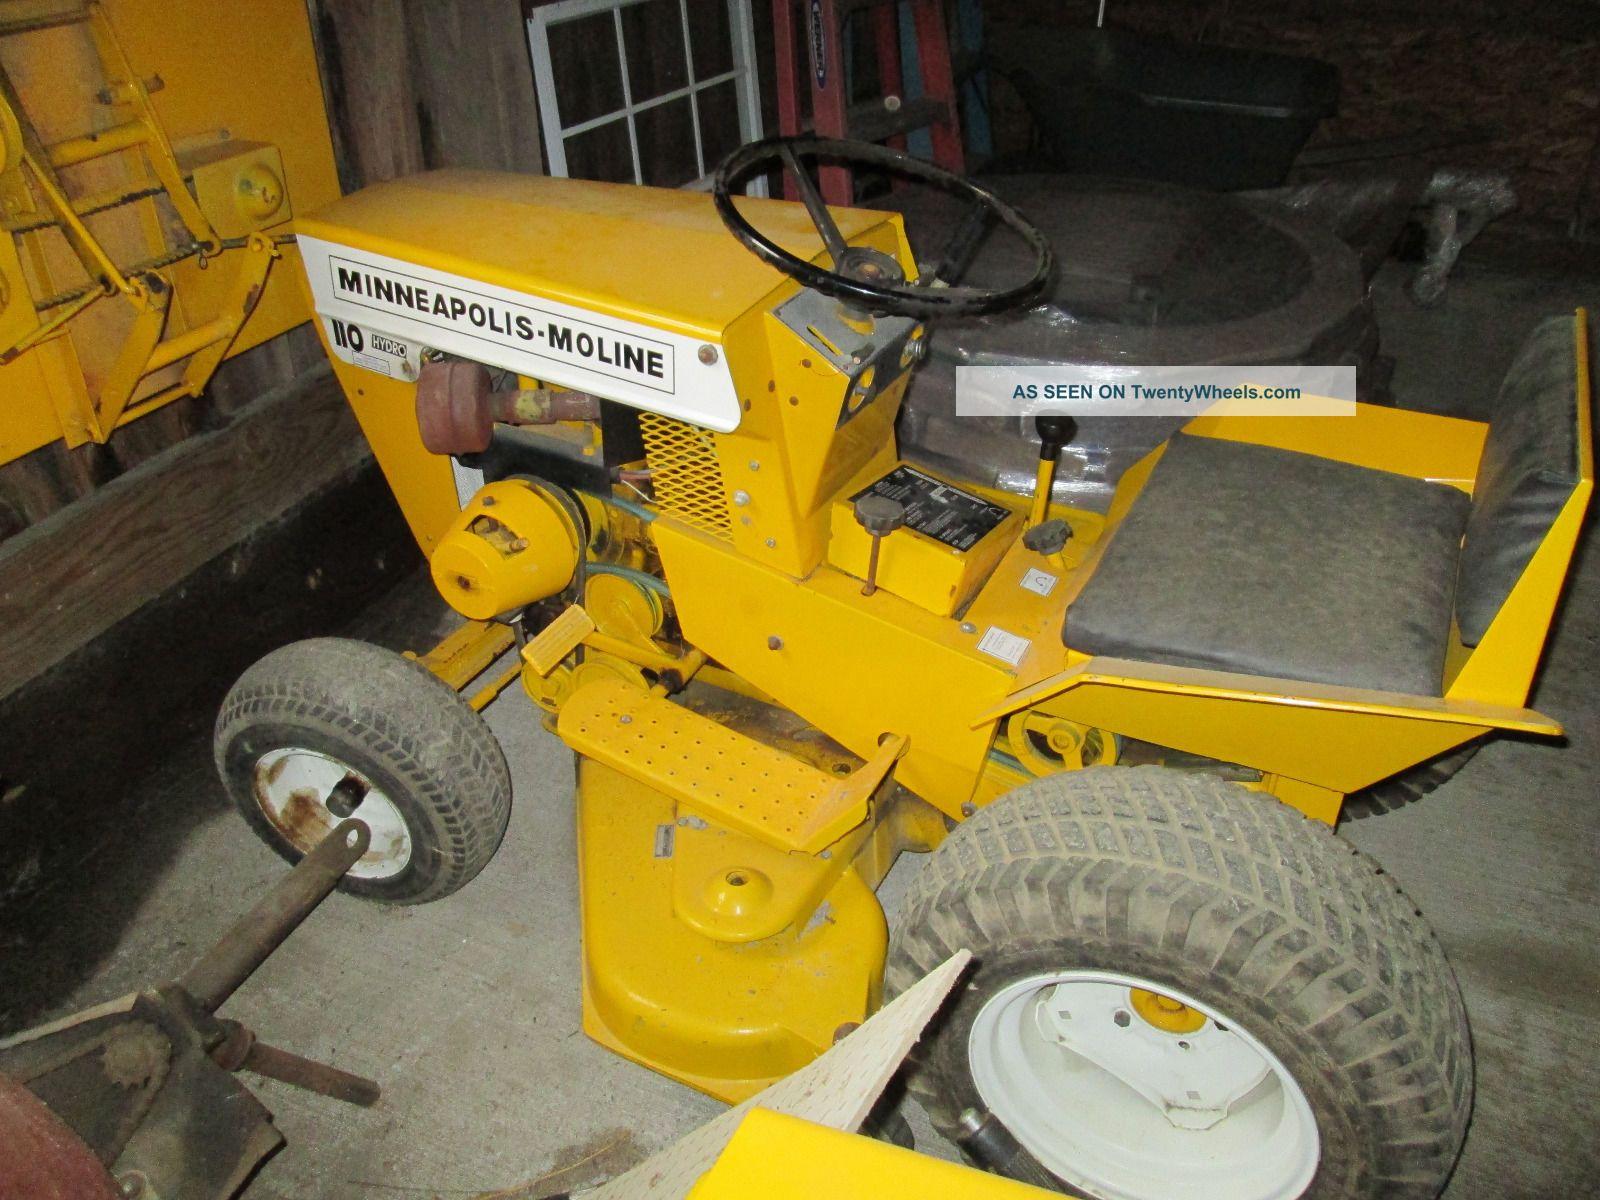 Minneapolis Moline 110 Hydro Garden Tractor Antique & Vintage Farm ...